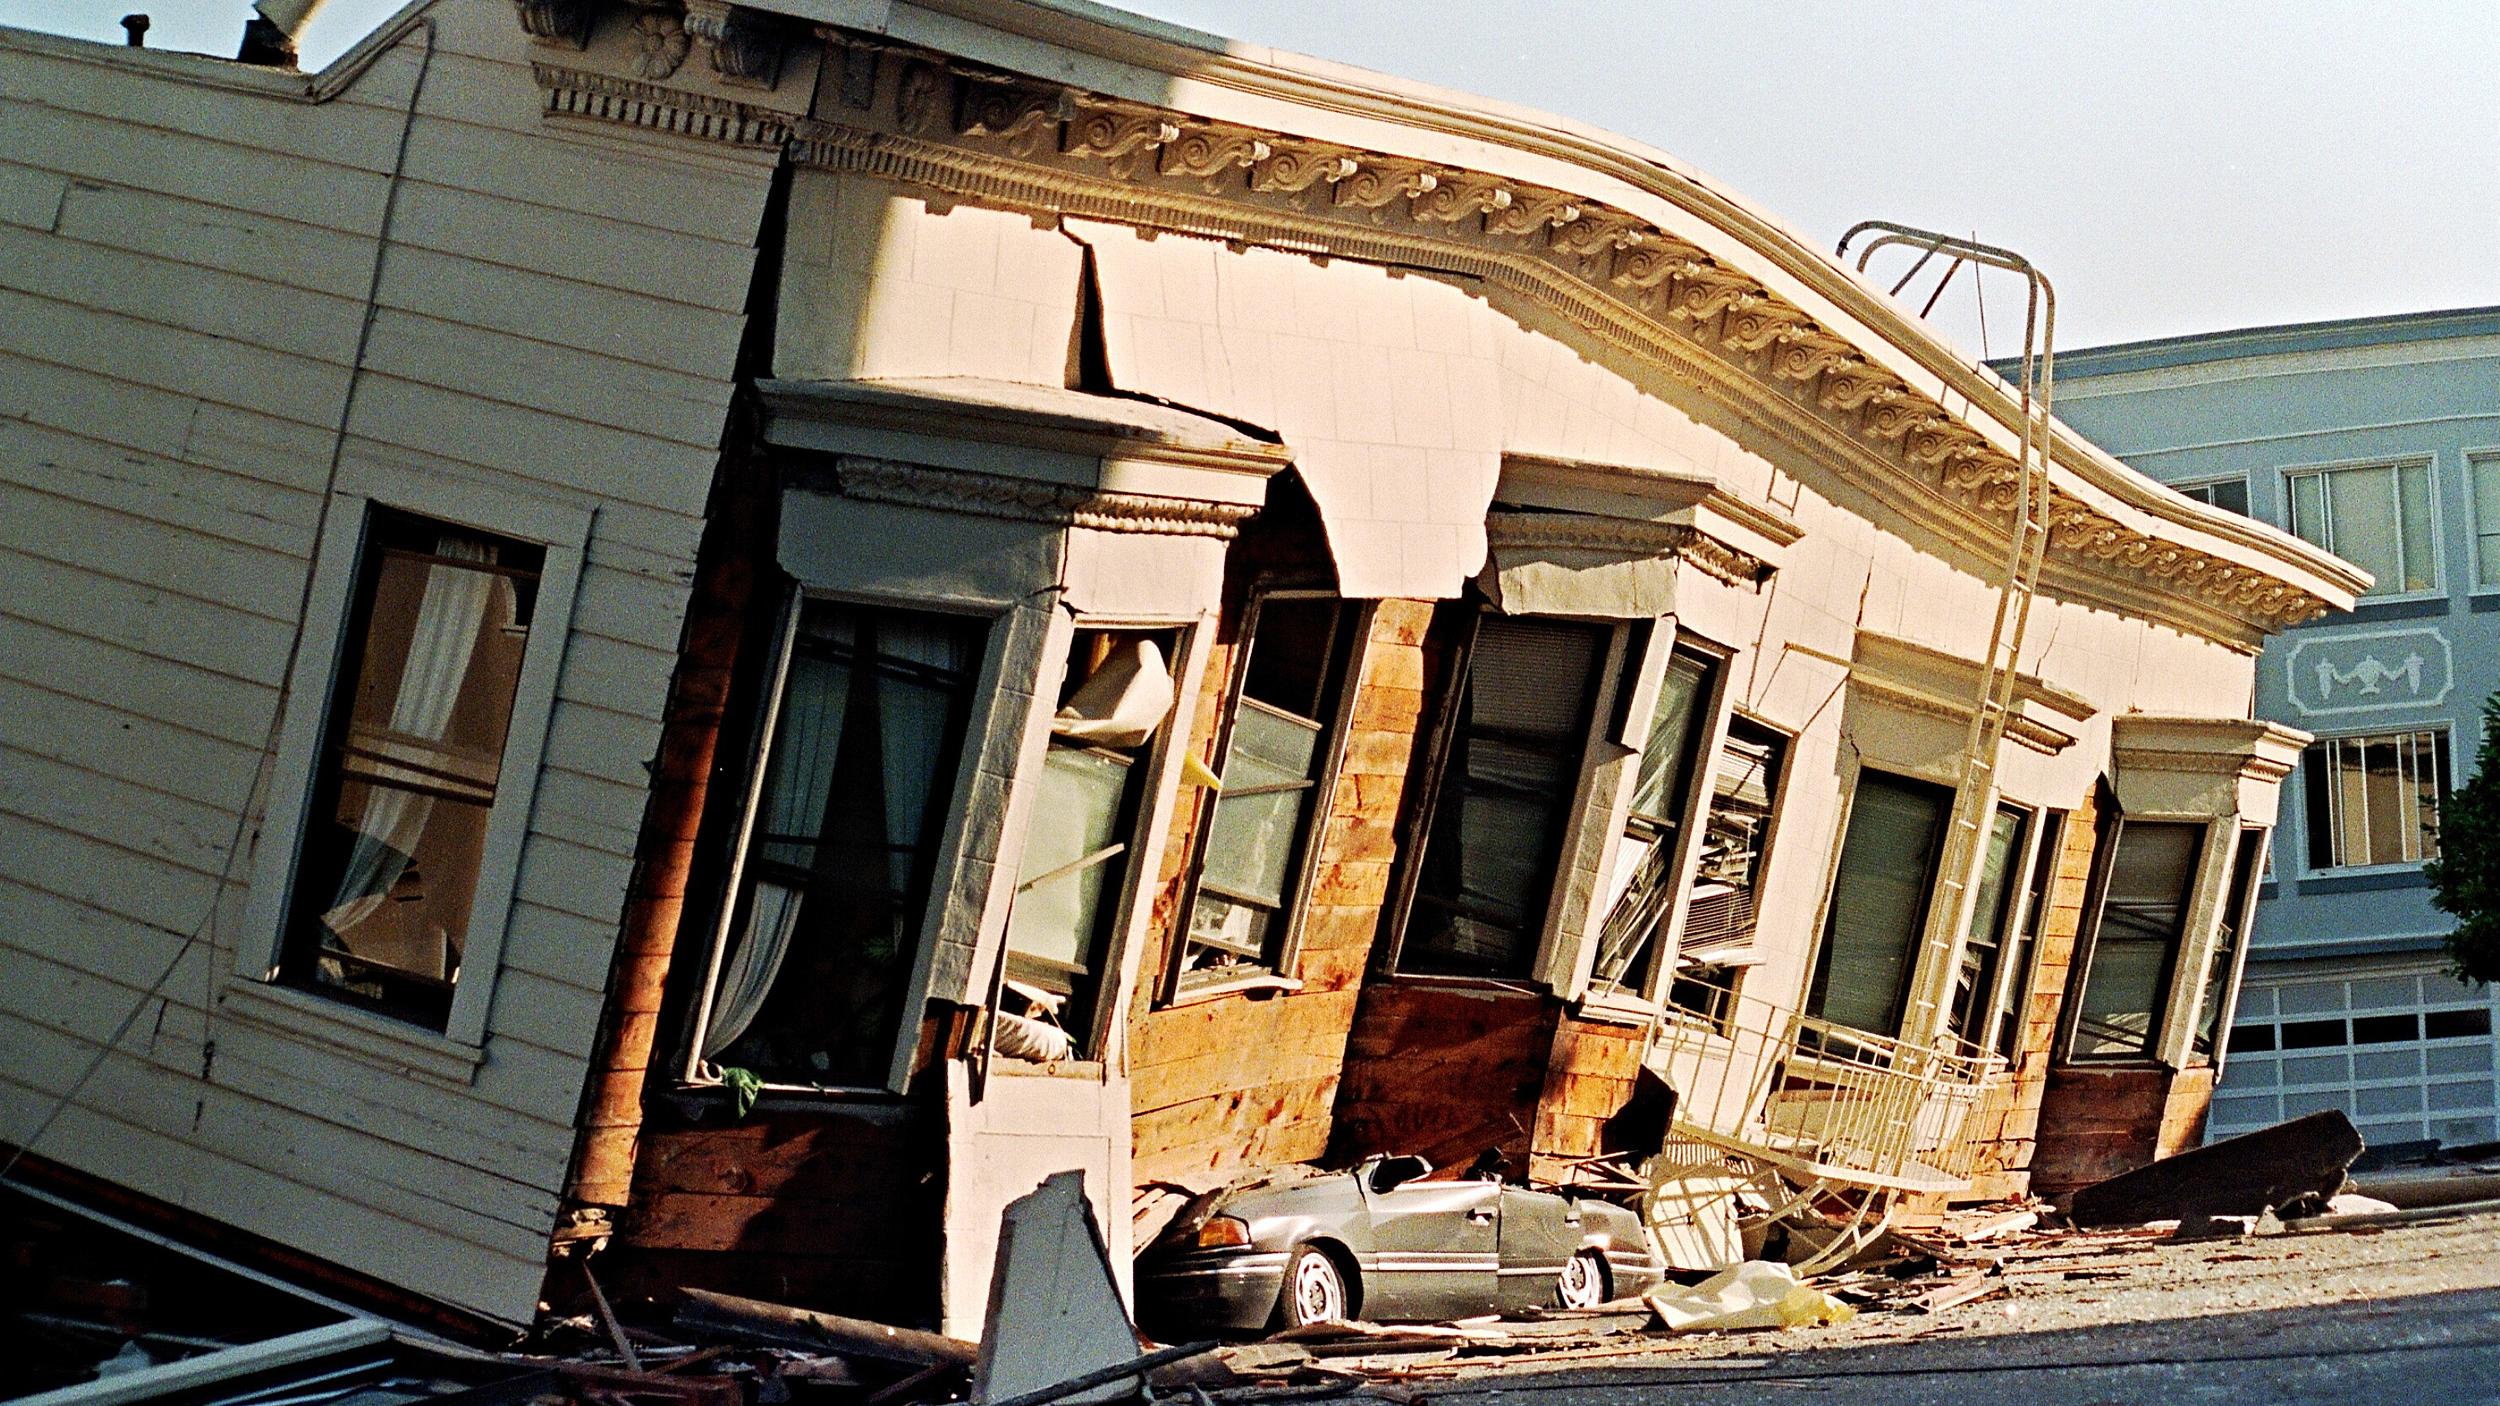 loma prieta the earthquake that stopped the world series